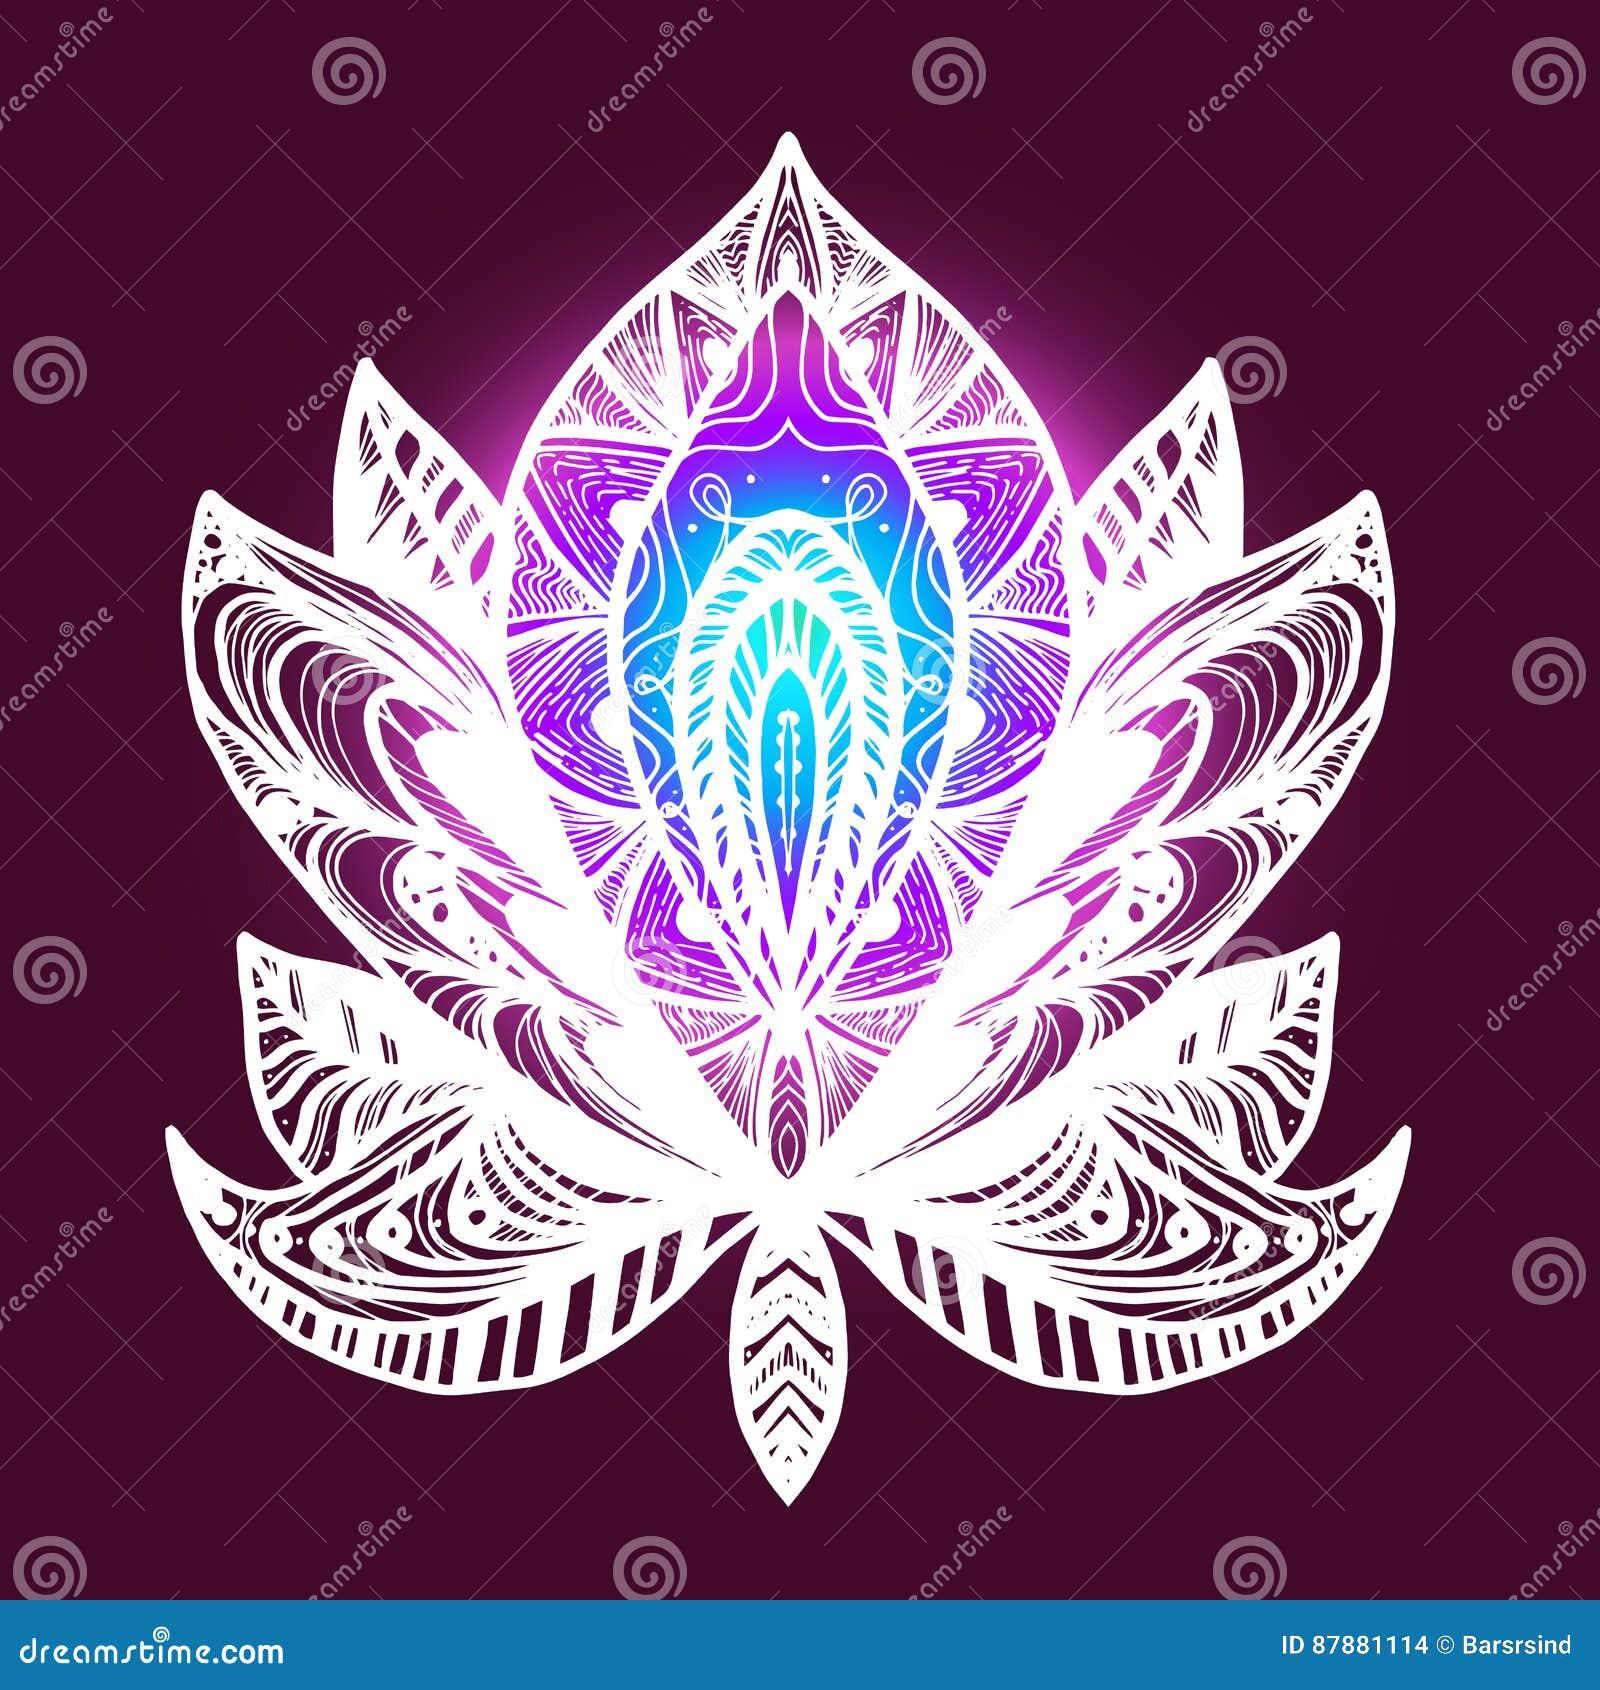 Flower lotus tattoo stock illustration illustration of decor 87881114 flower lotus magic symbol for print tattoo coloring bookfabric t shirt cloth in boho style tribal lotus design vector izmirmasajfo